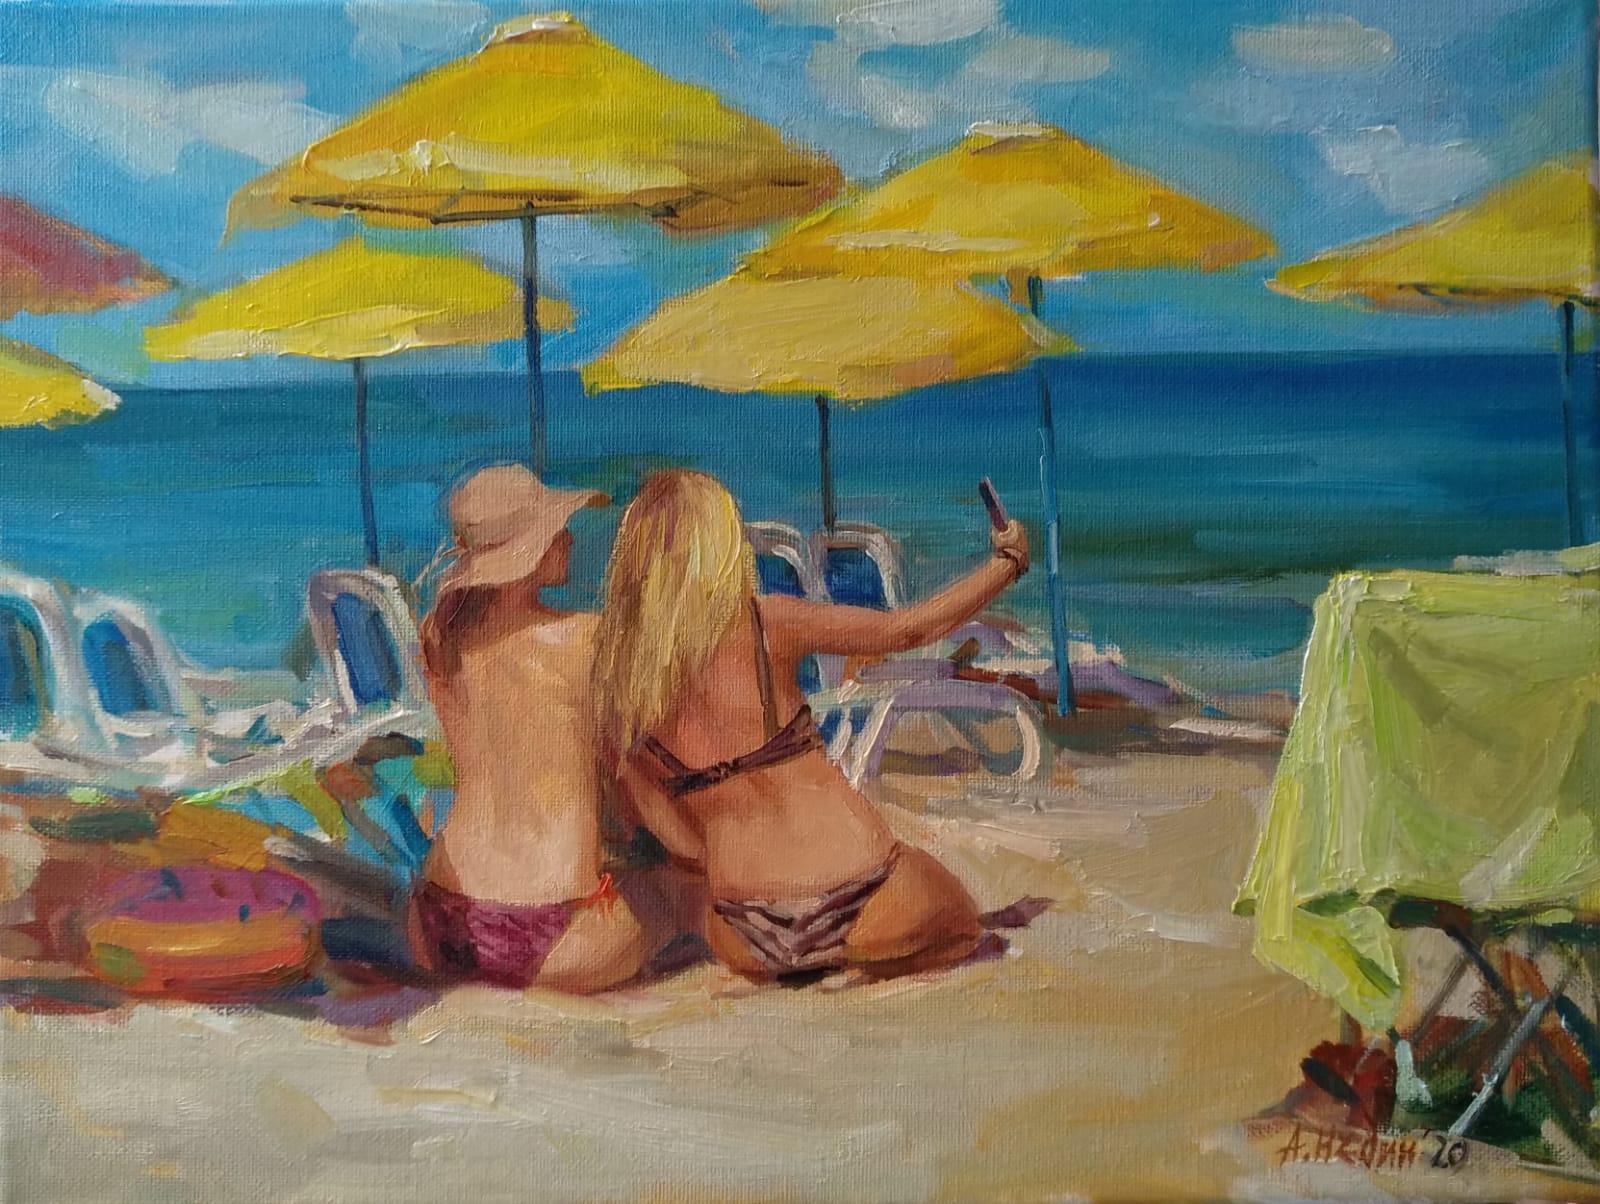 """Selfies on the beach"" Painting Angelina Nedin 2020"